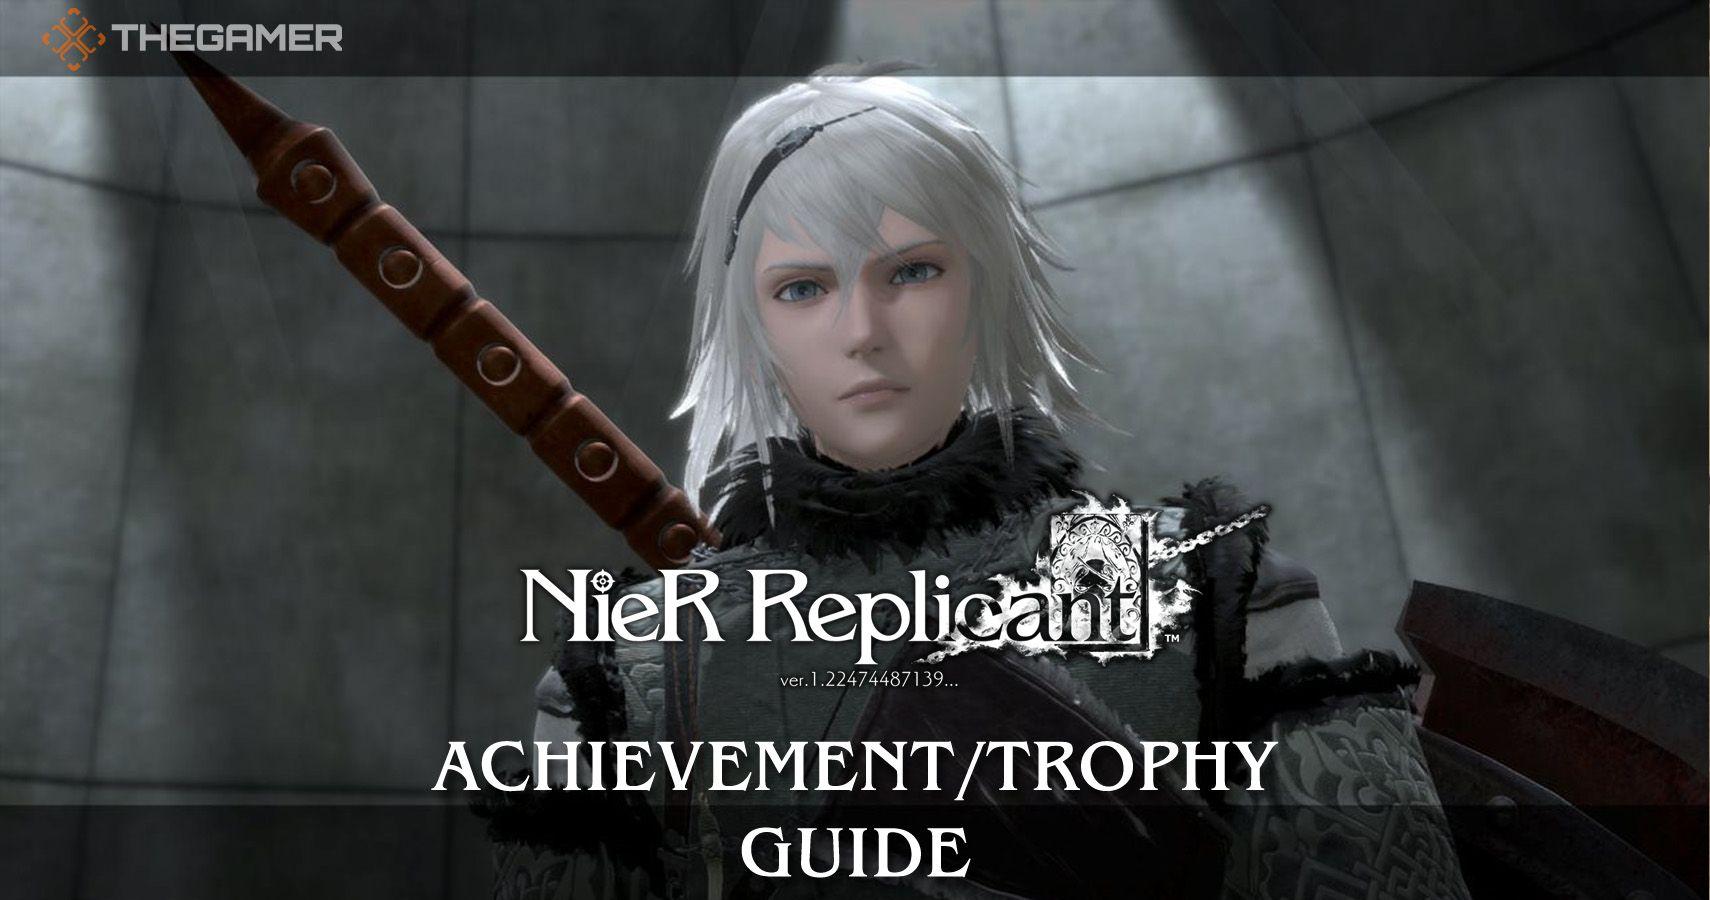 Replicante de Nier: Guía de logros / trofeos